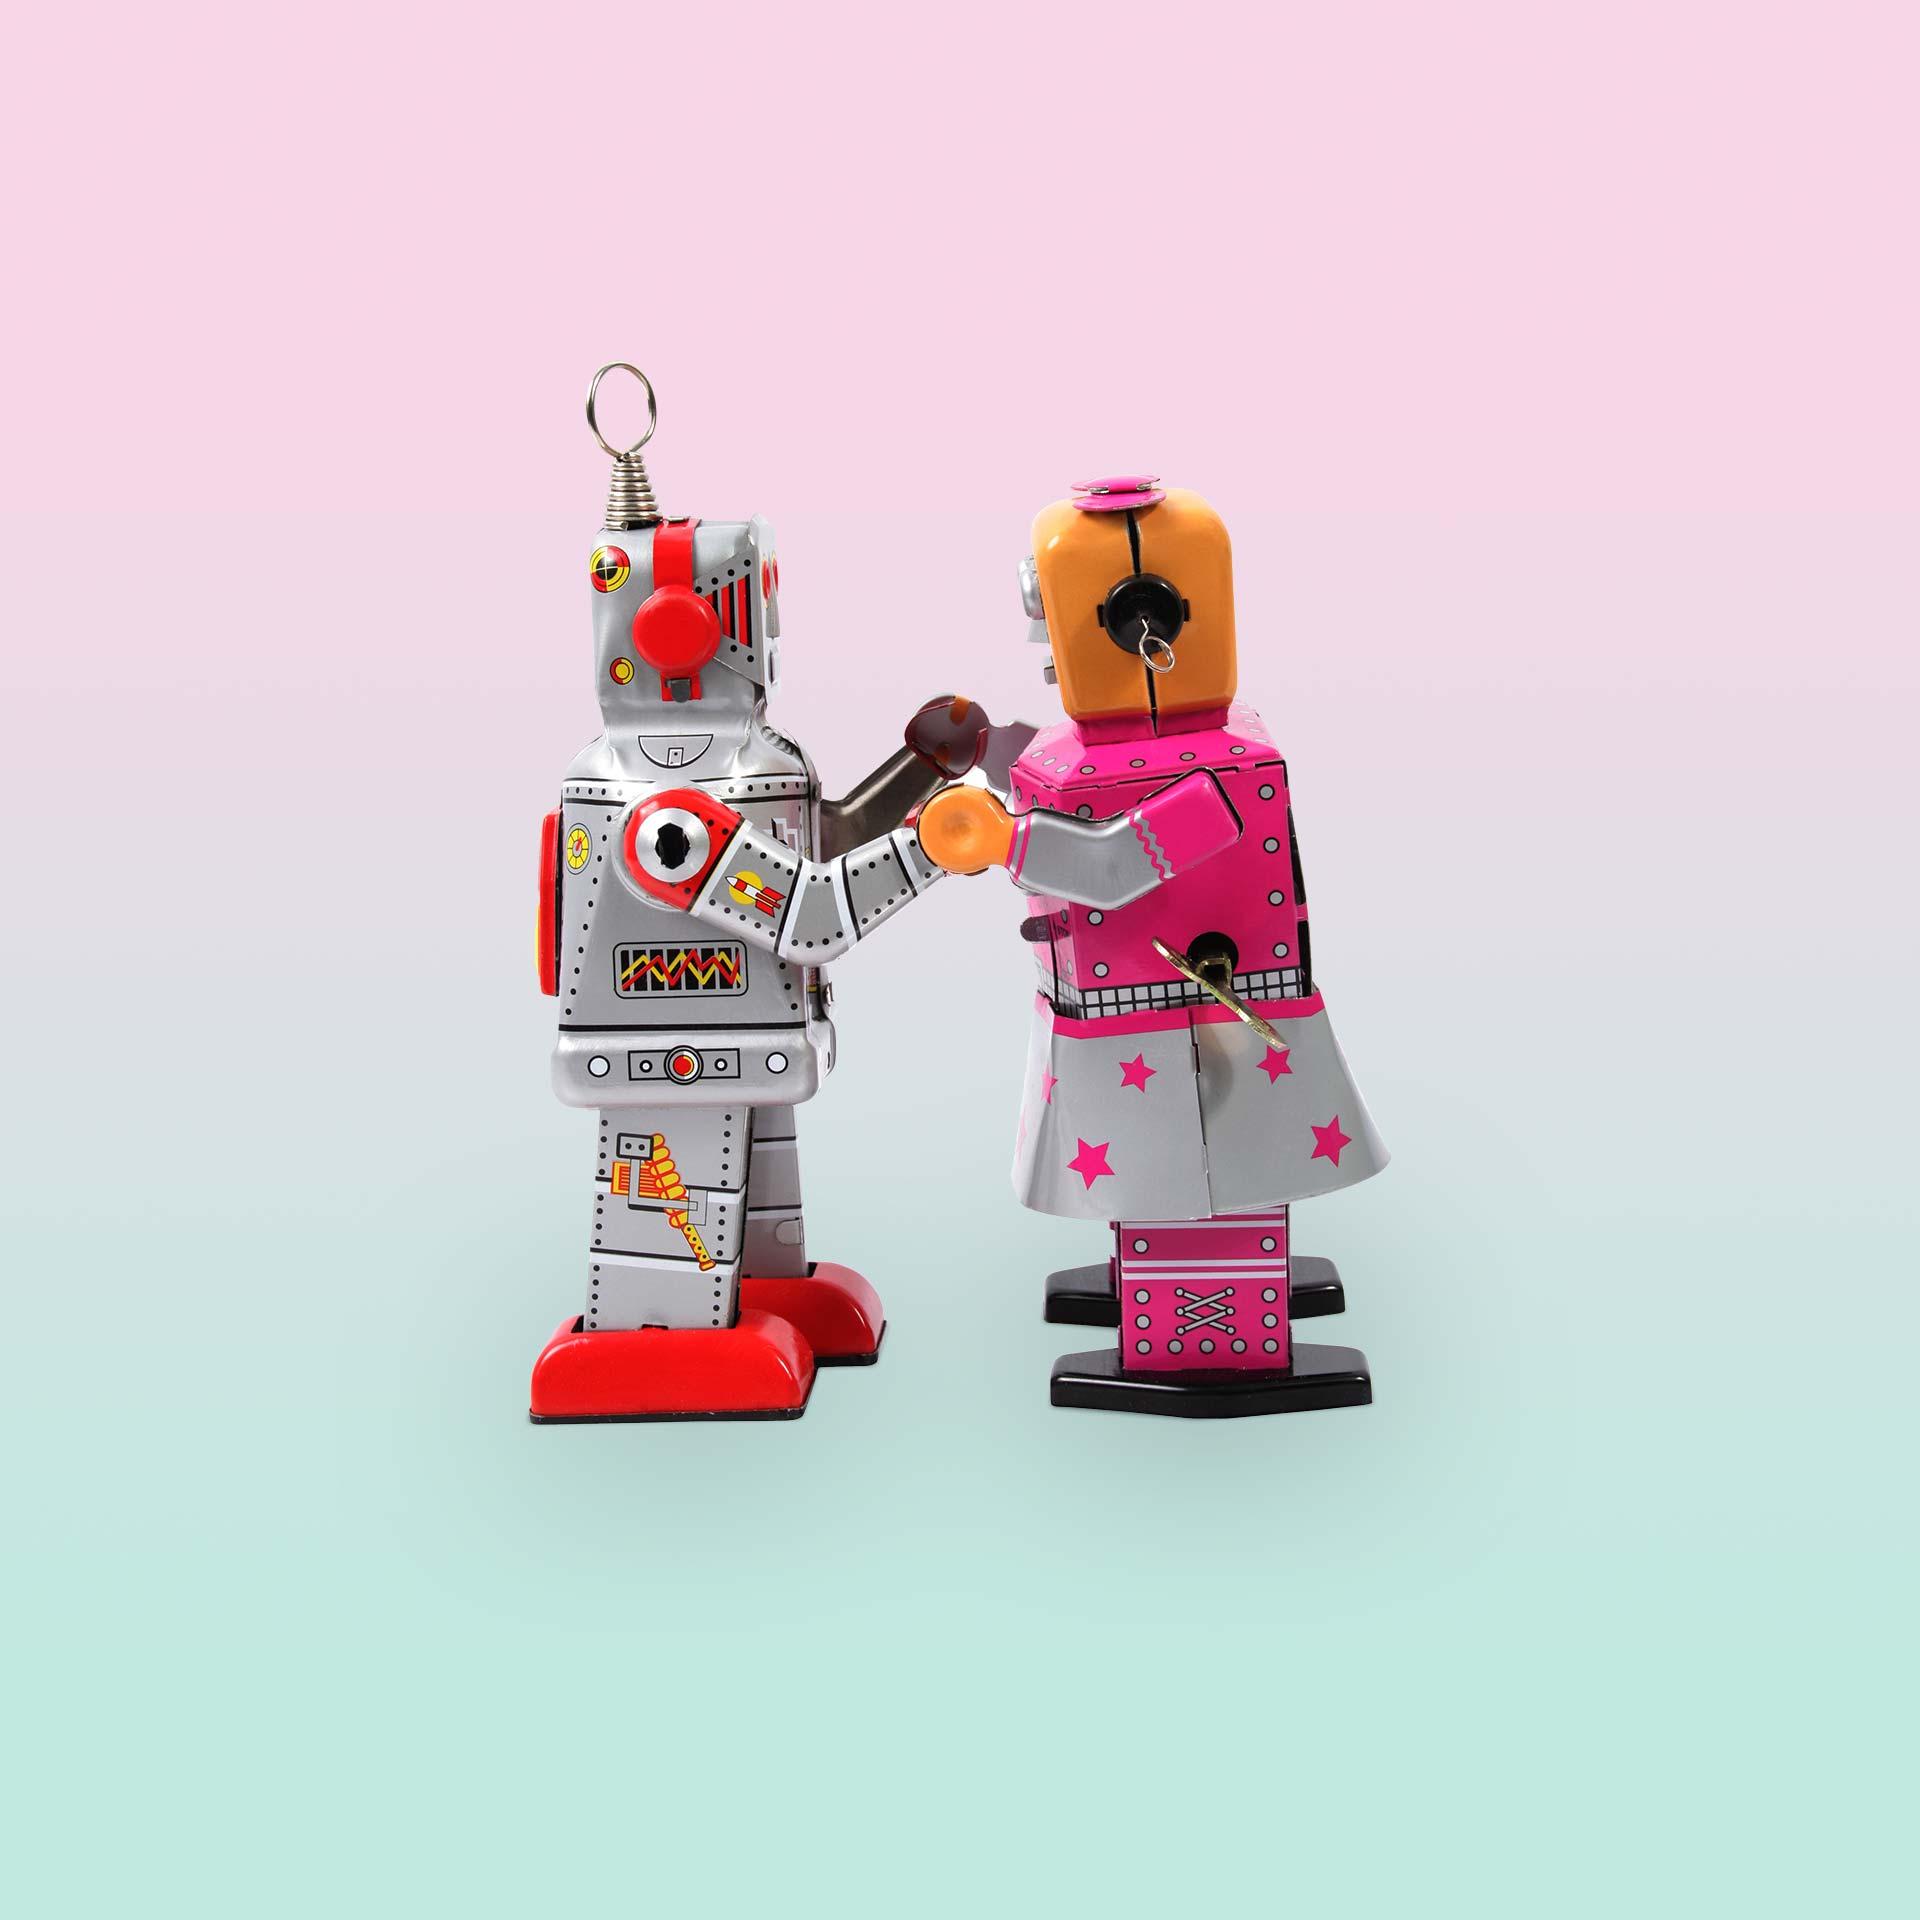 rfre_blogpost_tango-robots.jpg